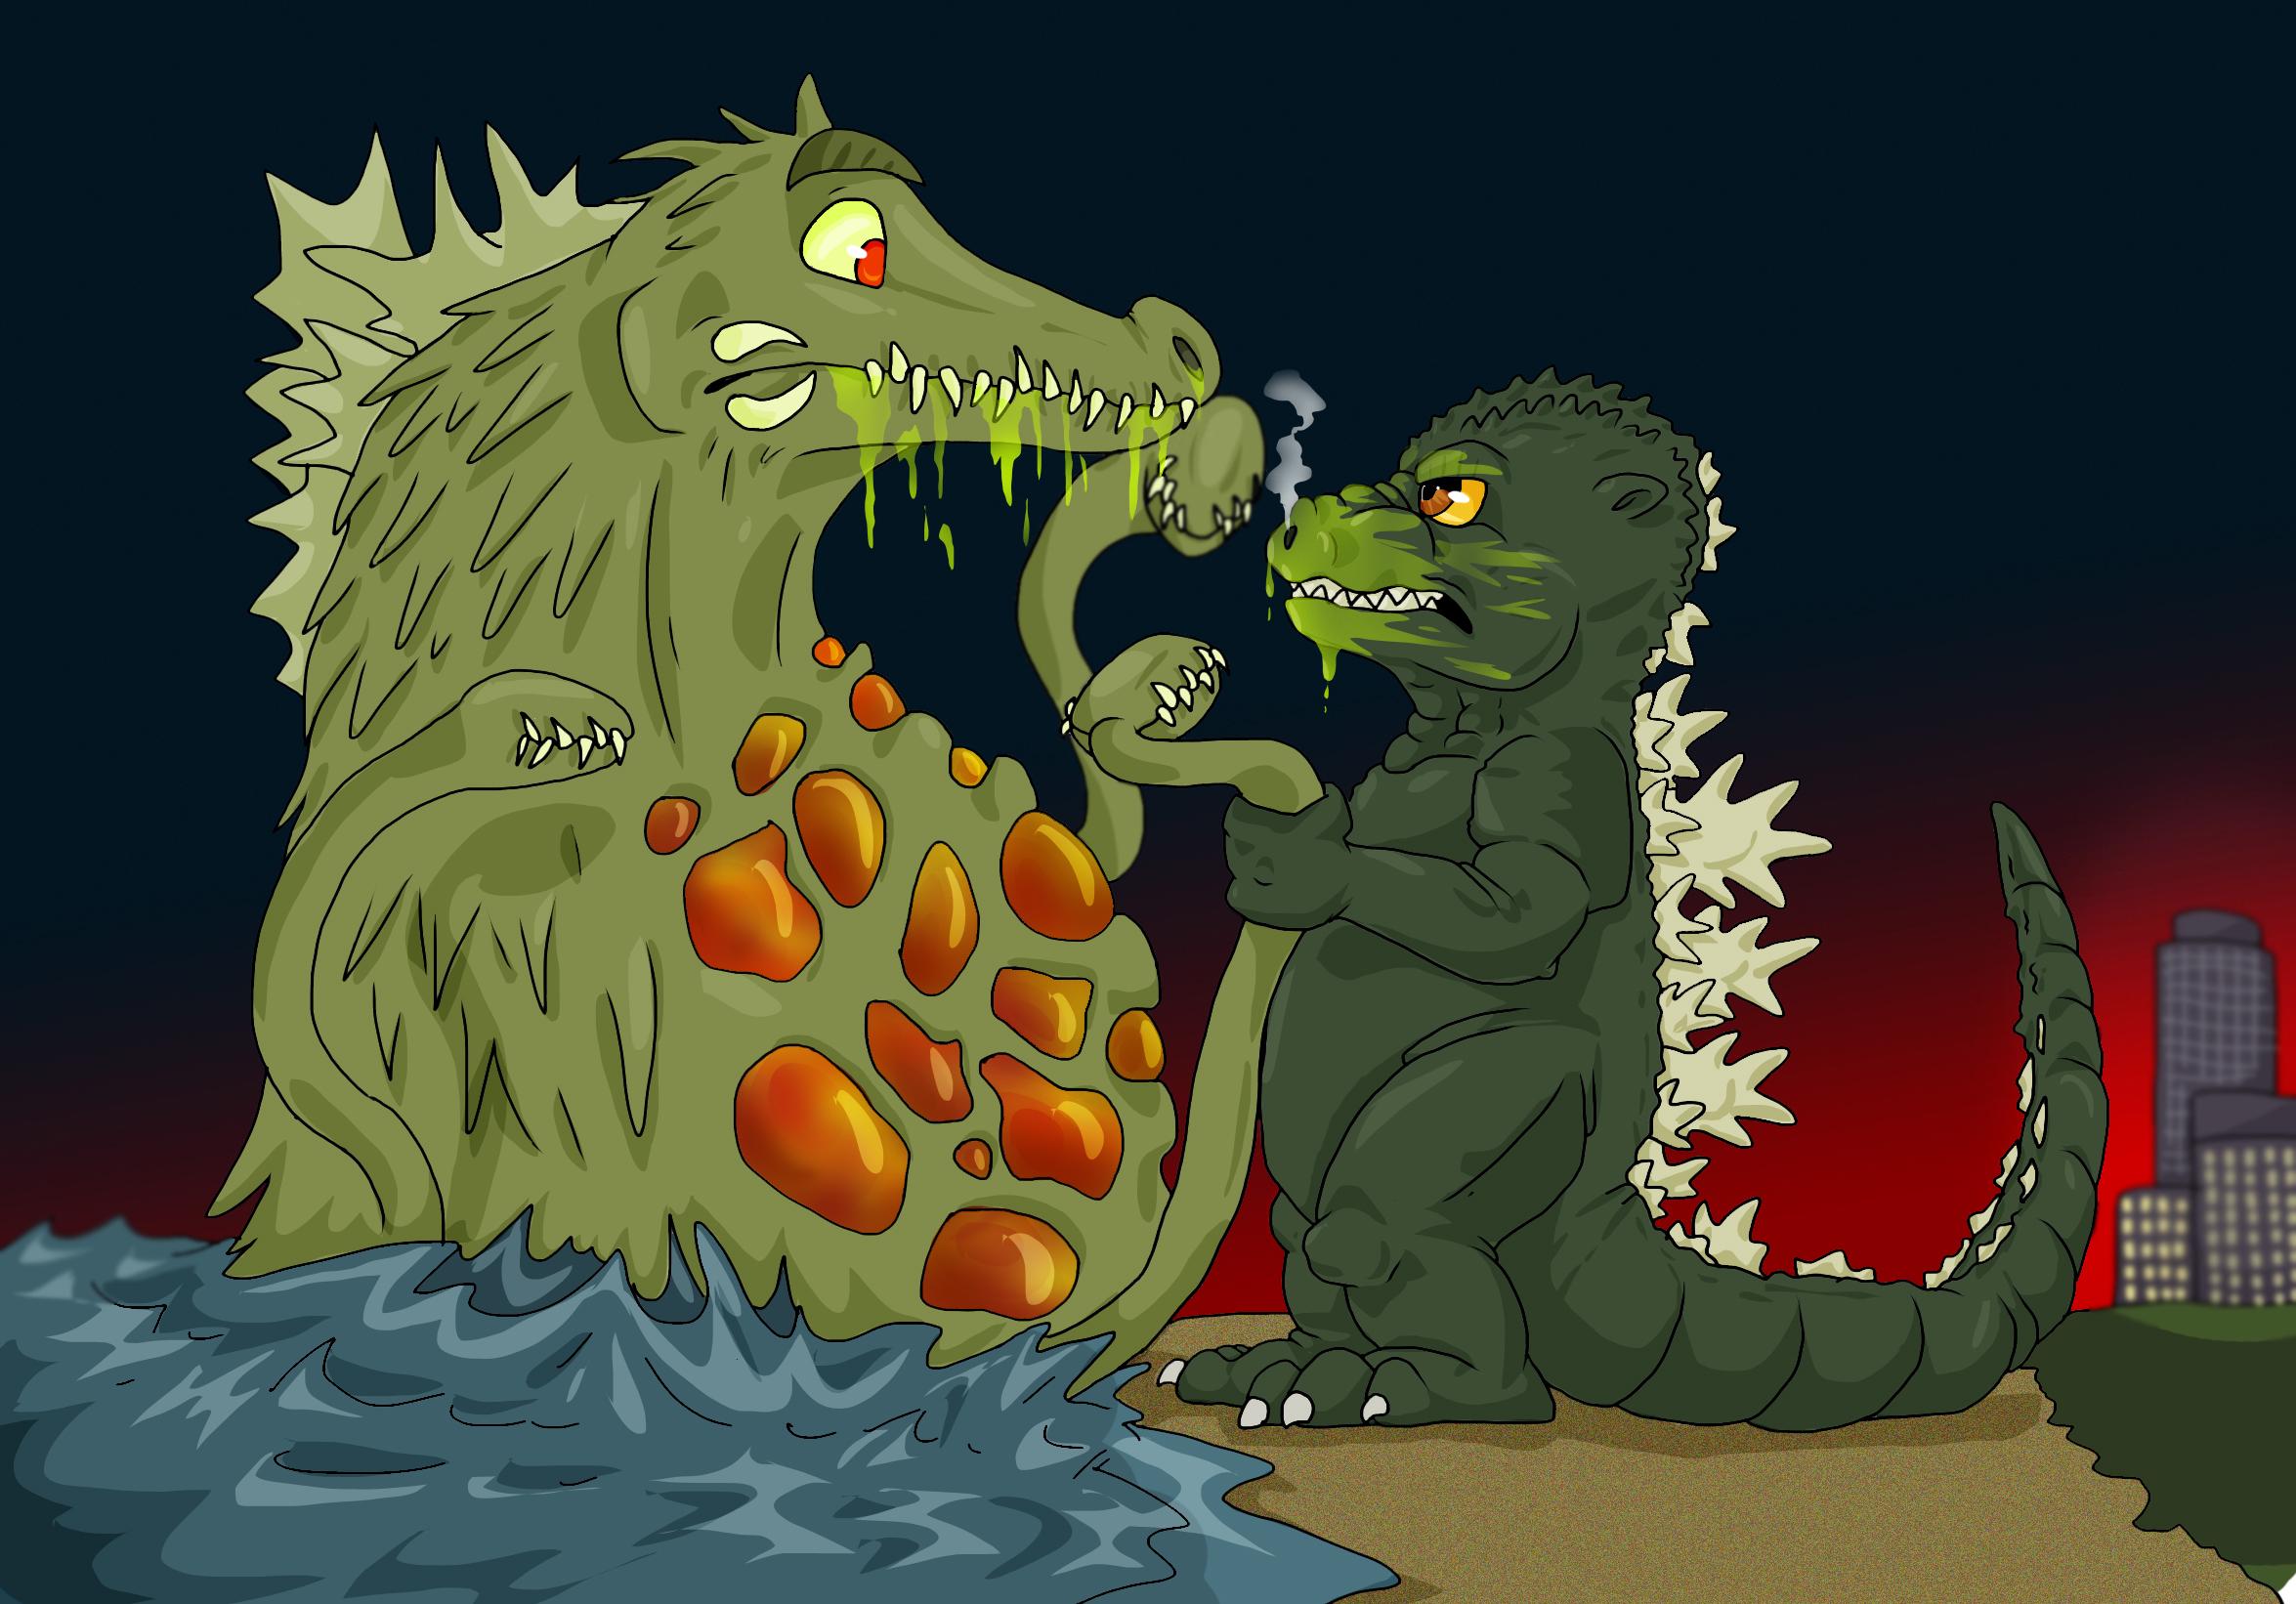 Godzilla vs Biollante by Natsuakai on DeviantArt